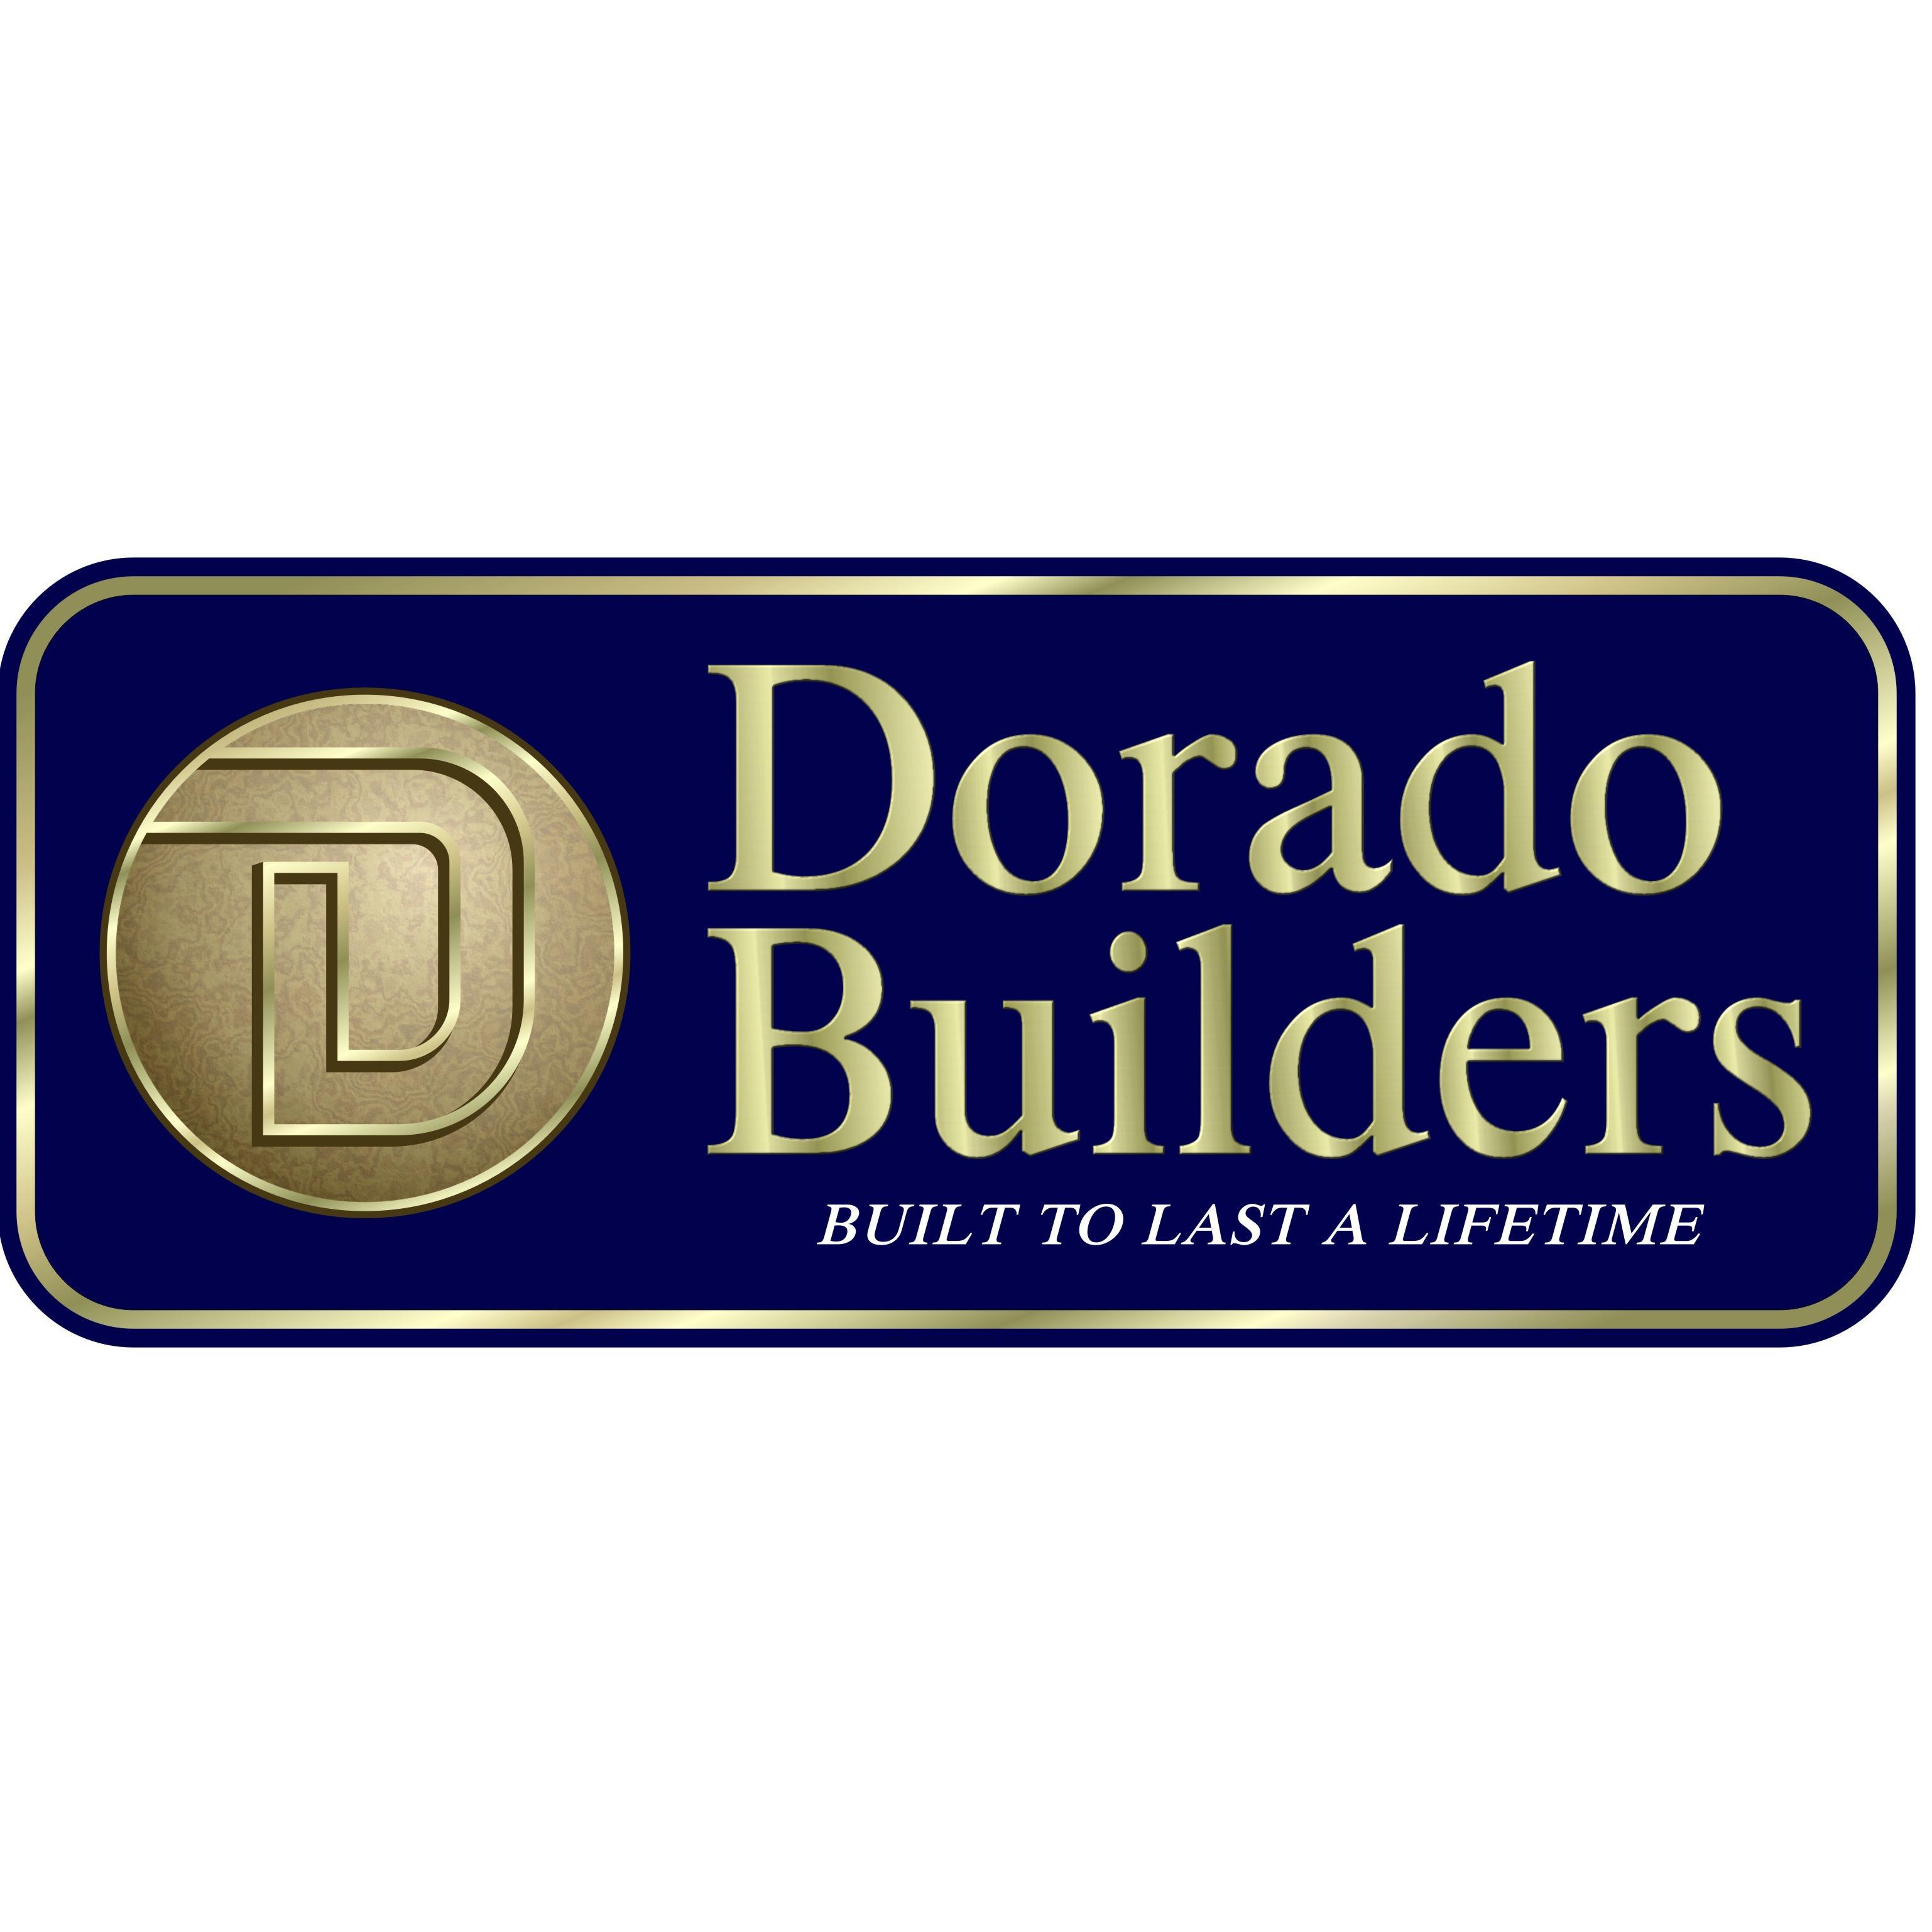 Dorado Builders - East End on the Bayou Homes